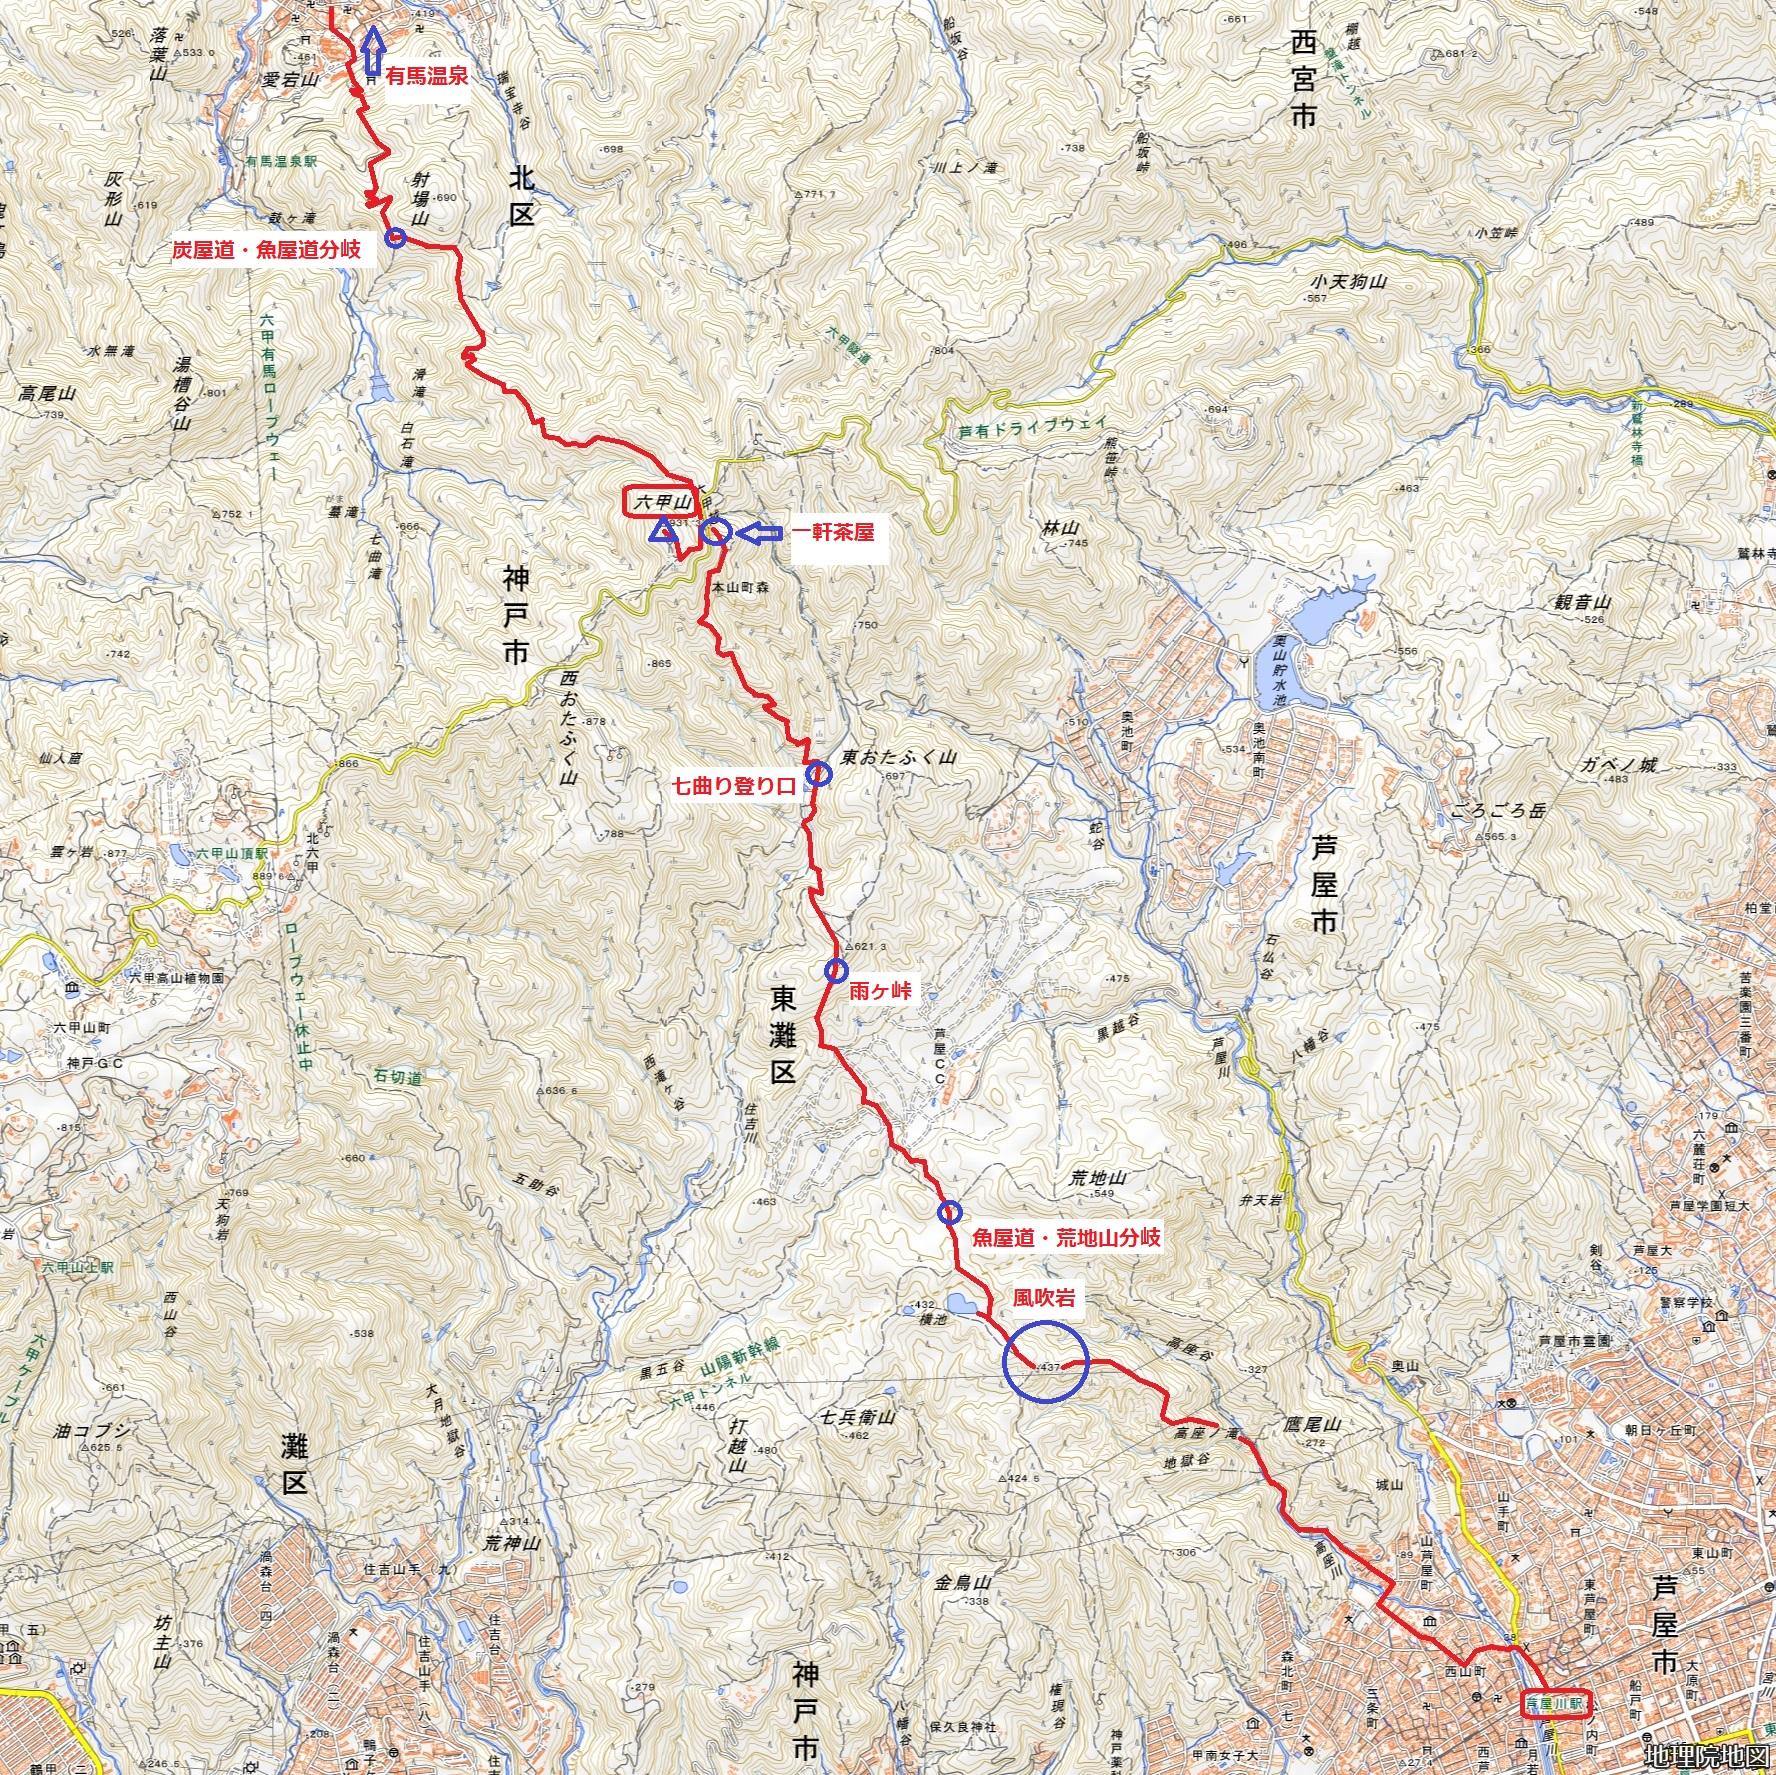 地理院地図 六甲山 芦名川液から有馬温泉